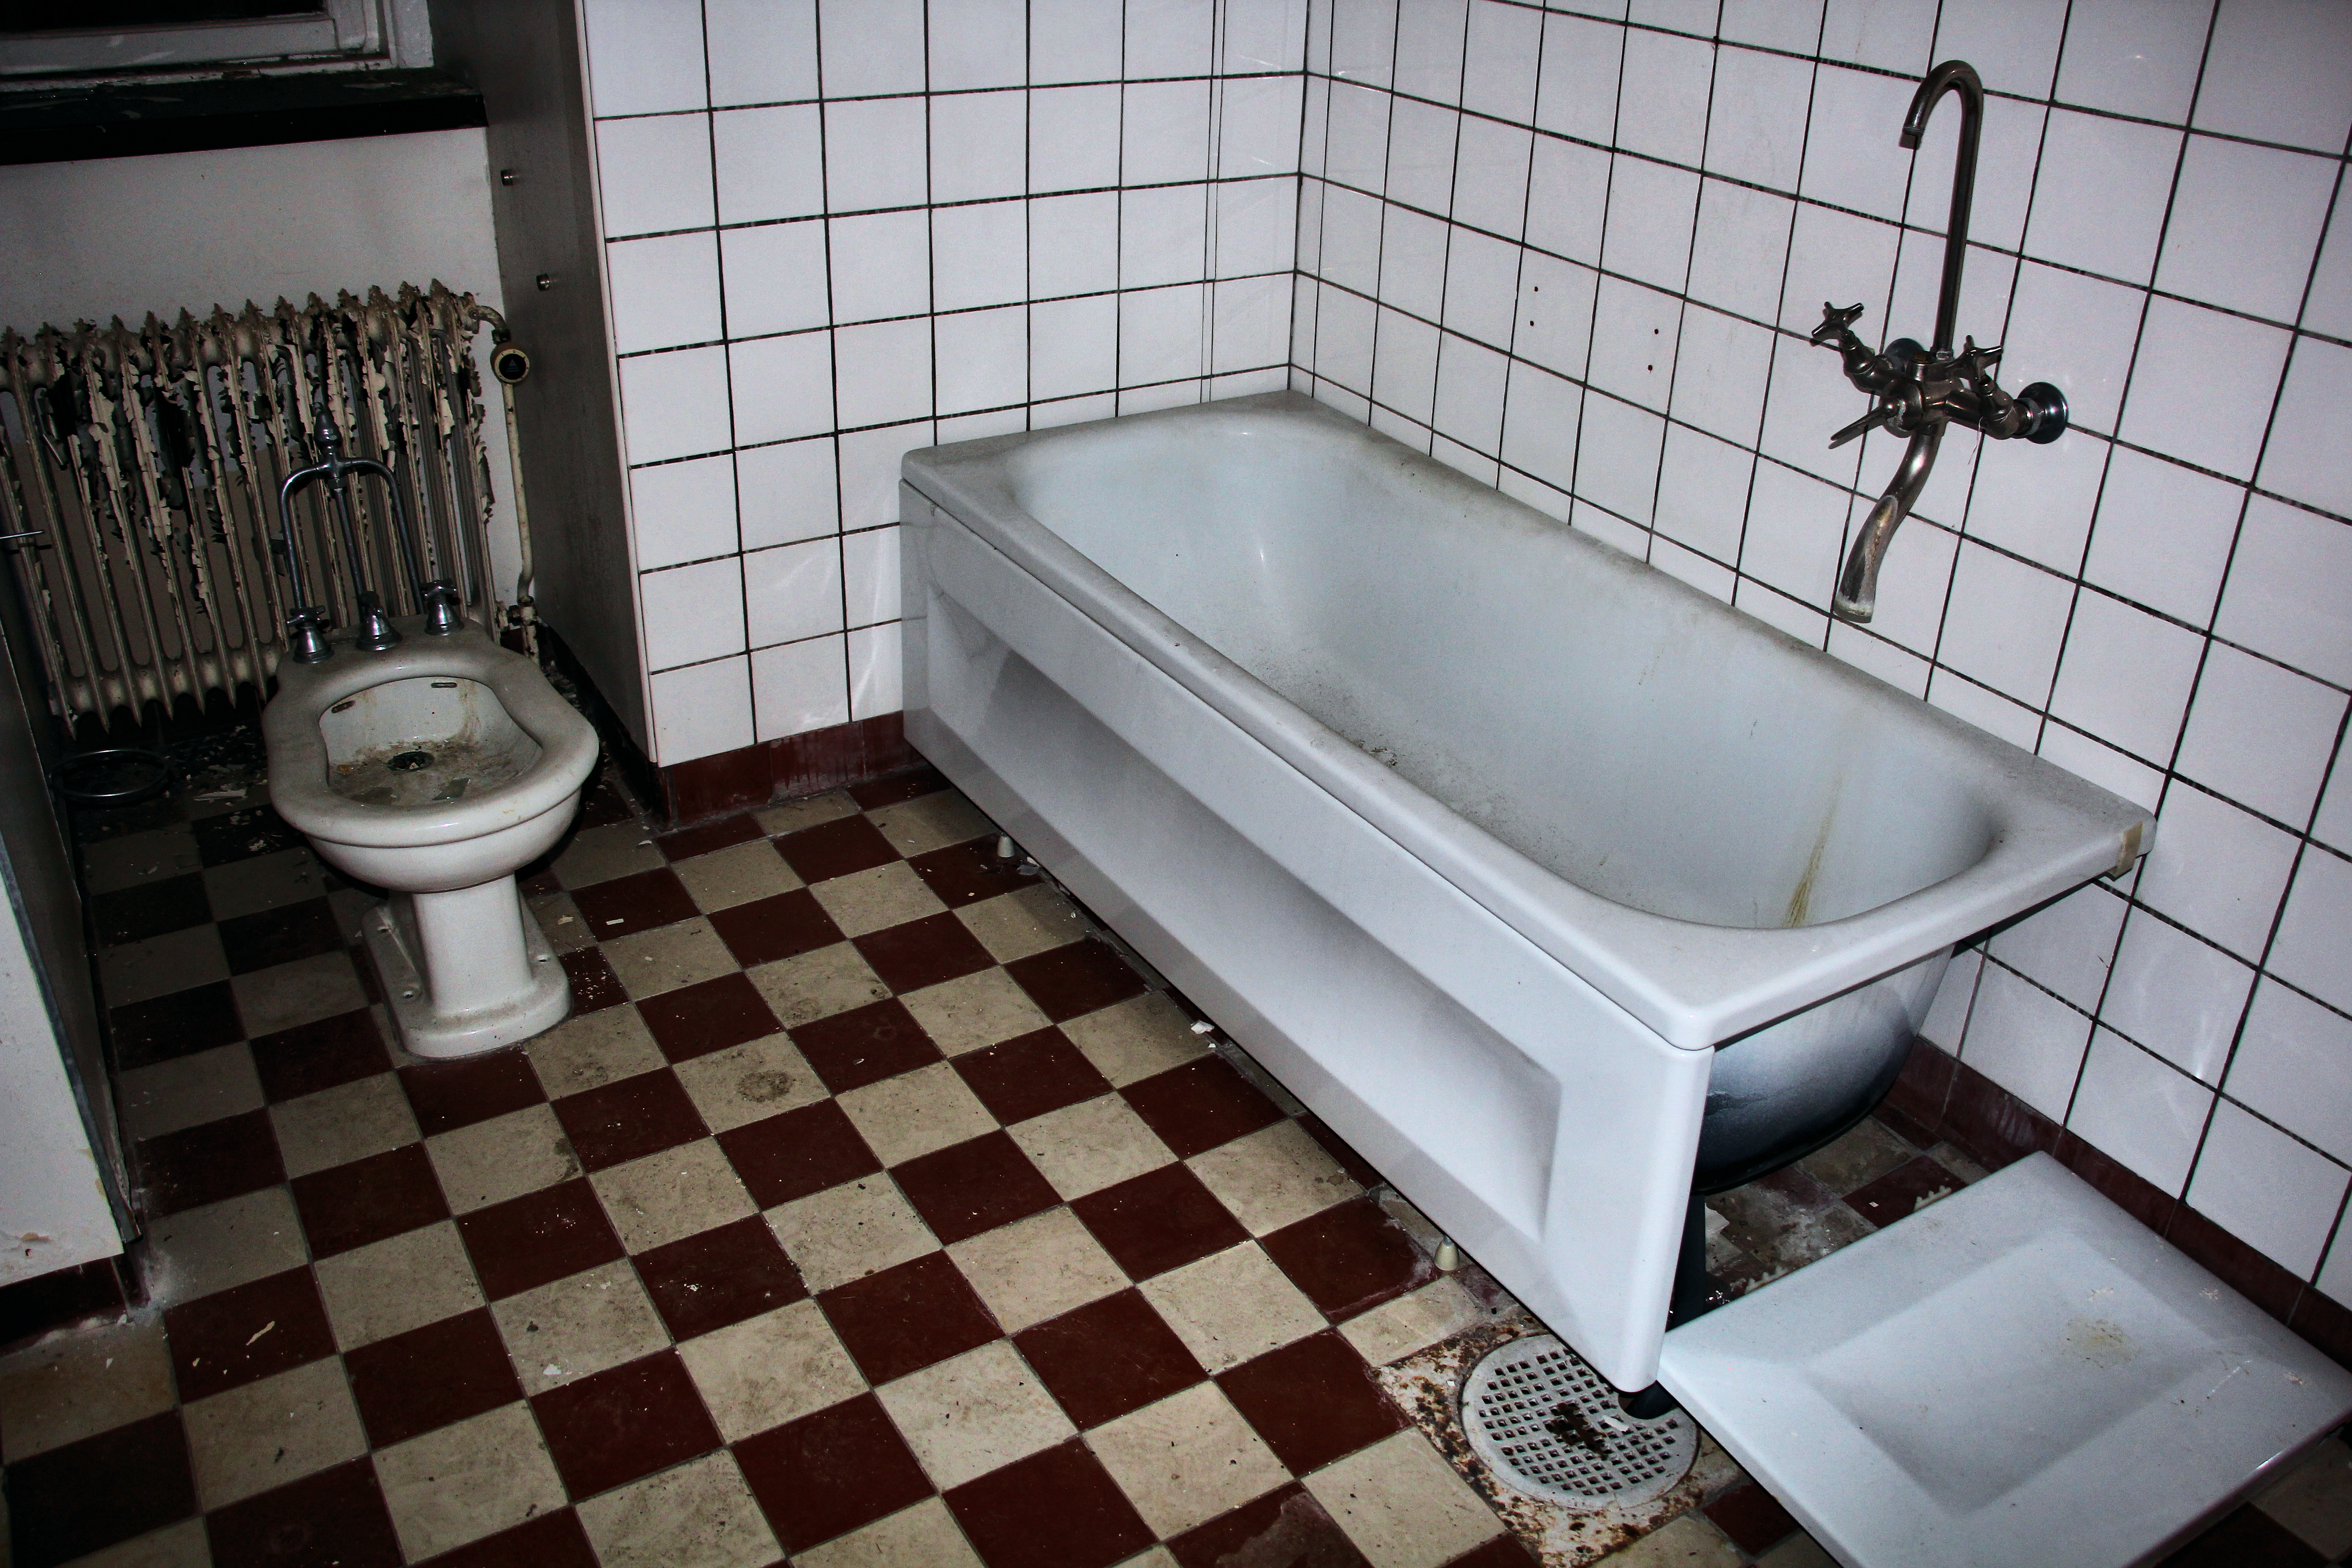 hospital bathroom. Abandoned hospital bathroom by TheManWithTheHat666  on DeviantArt